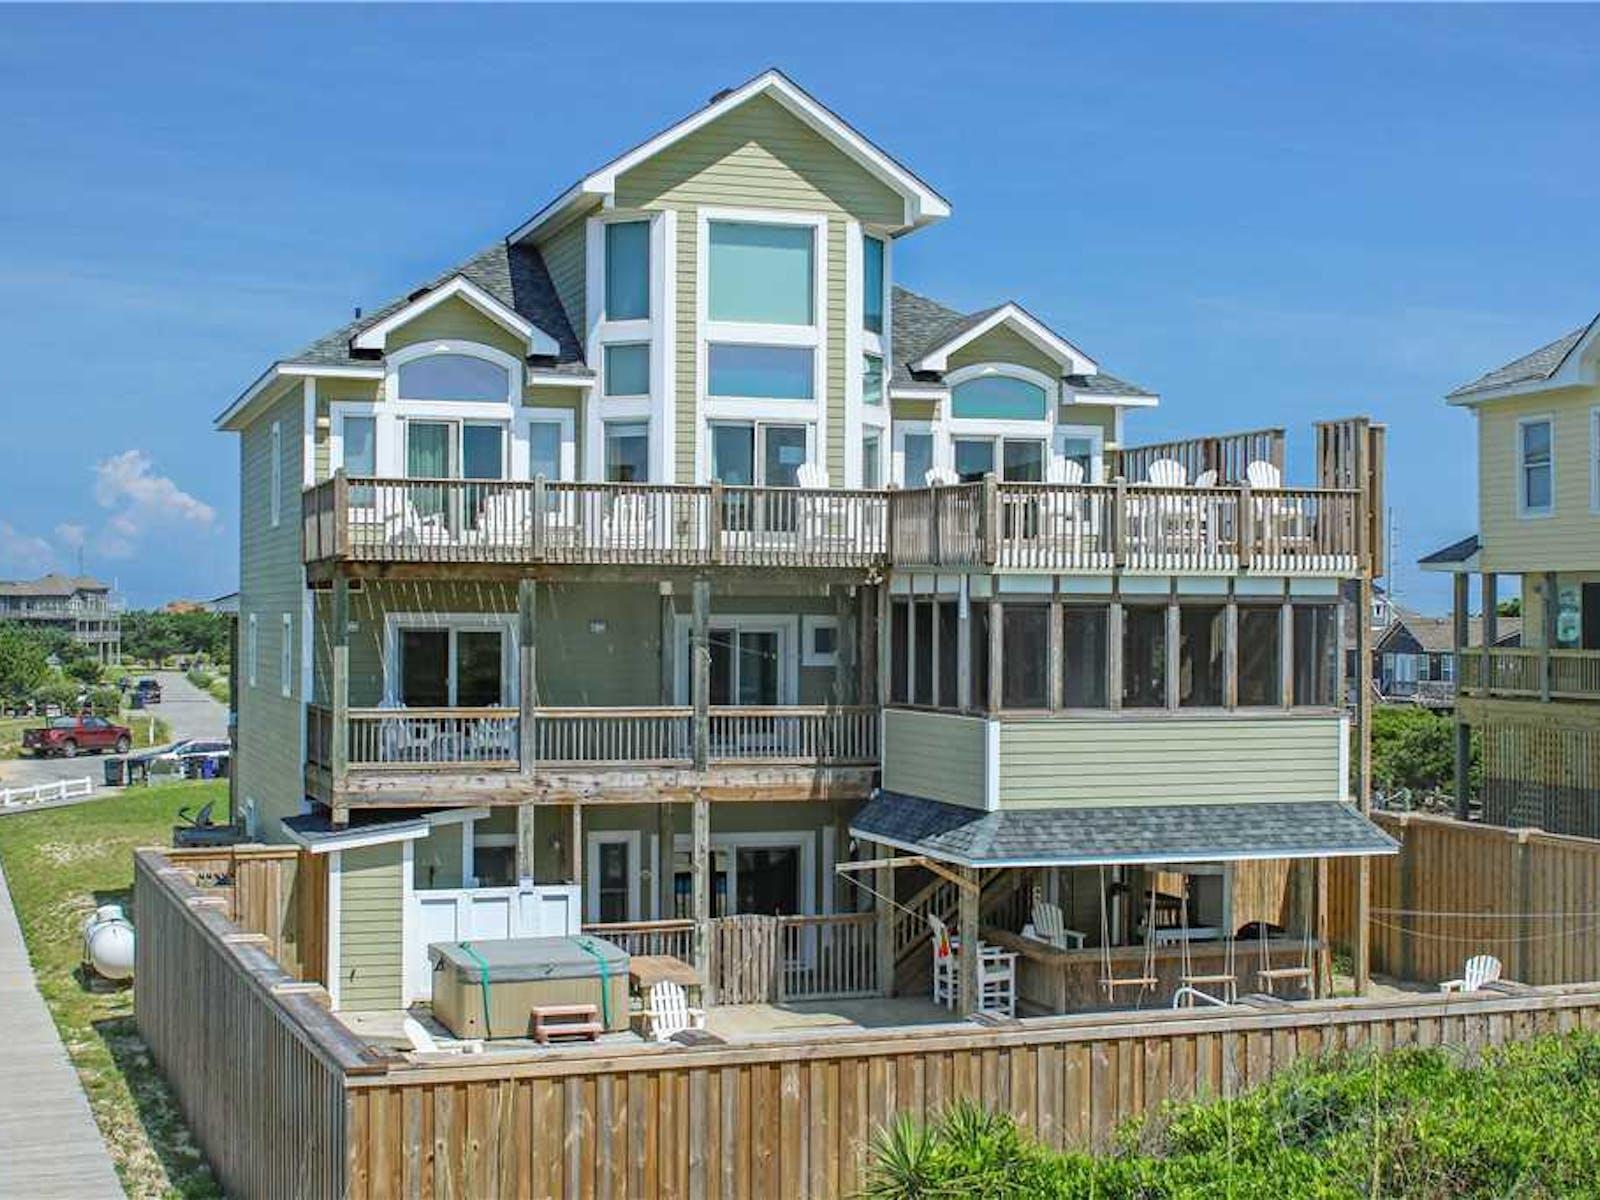 Beach house on Hatteras Island